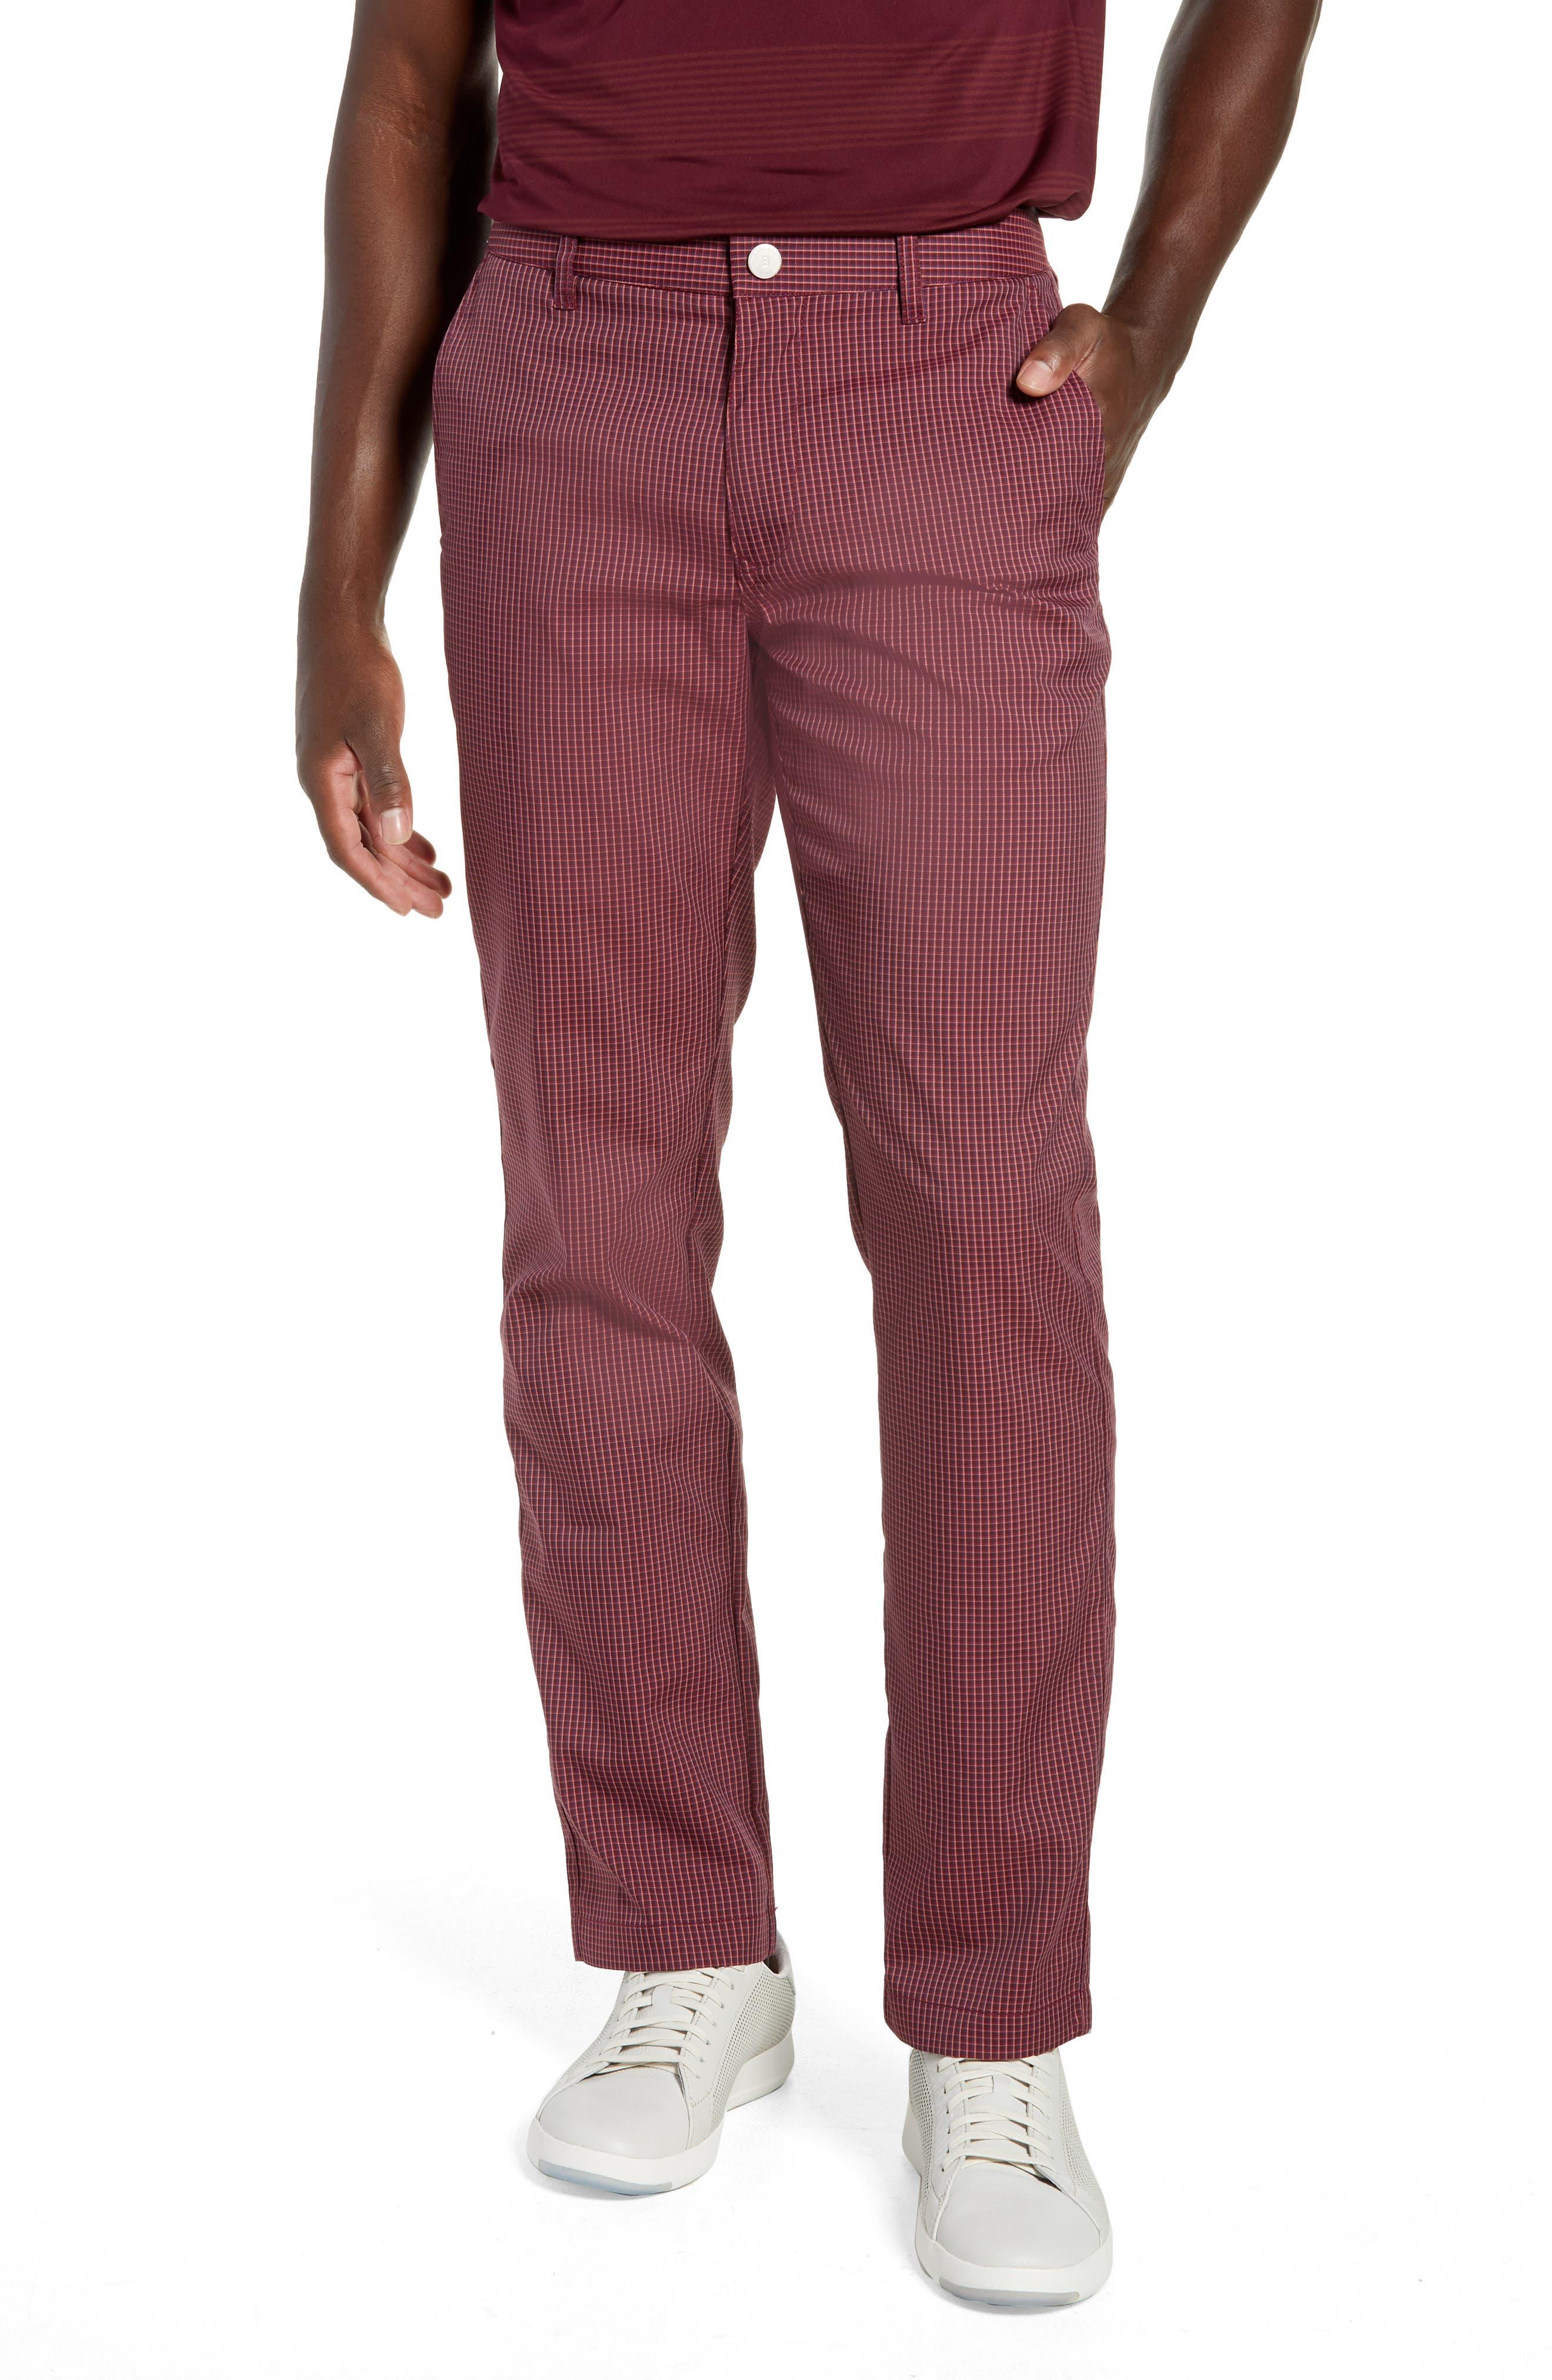 Highland Slim Fit Golf Pants,                         Main,                         color, RED PLAID